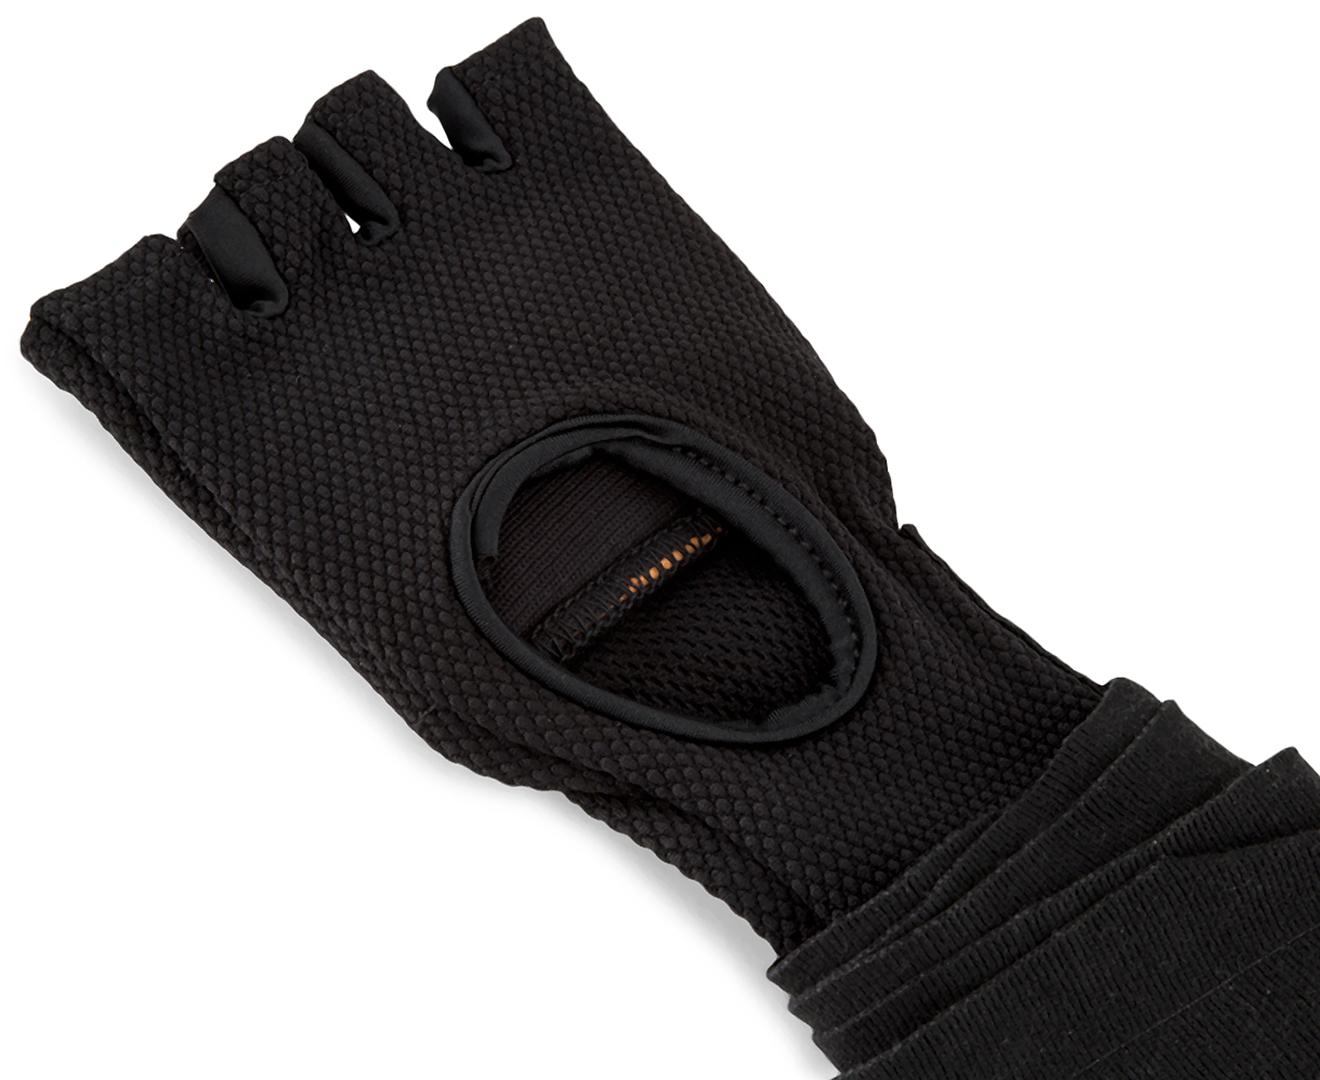 BLACK STINGELASTICISED HAND WRAPS